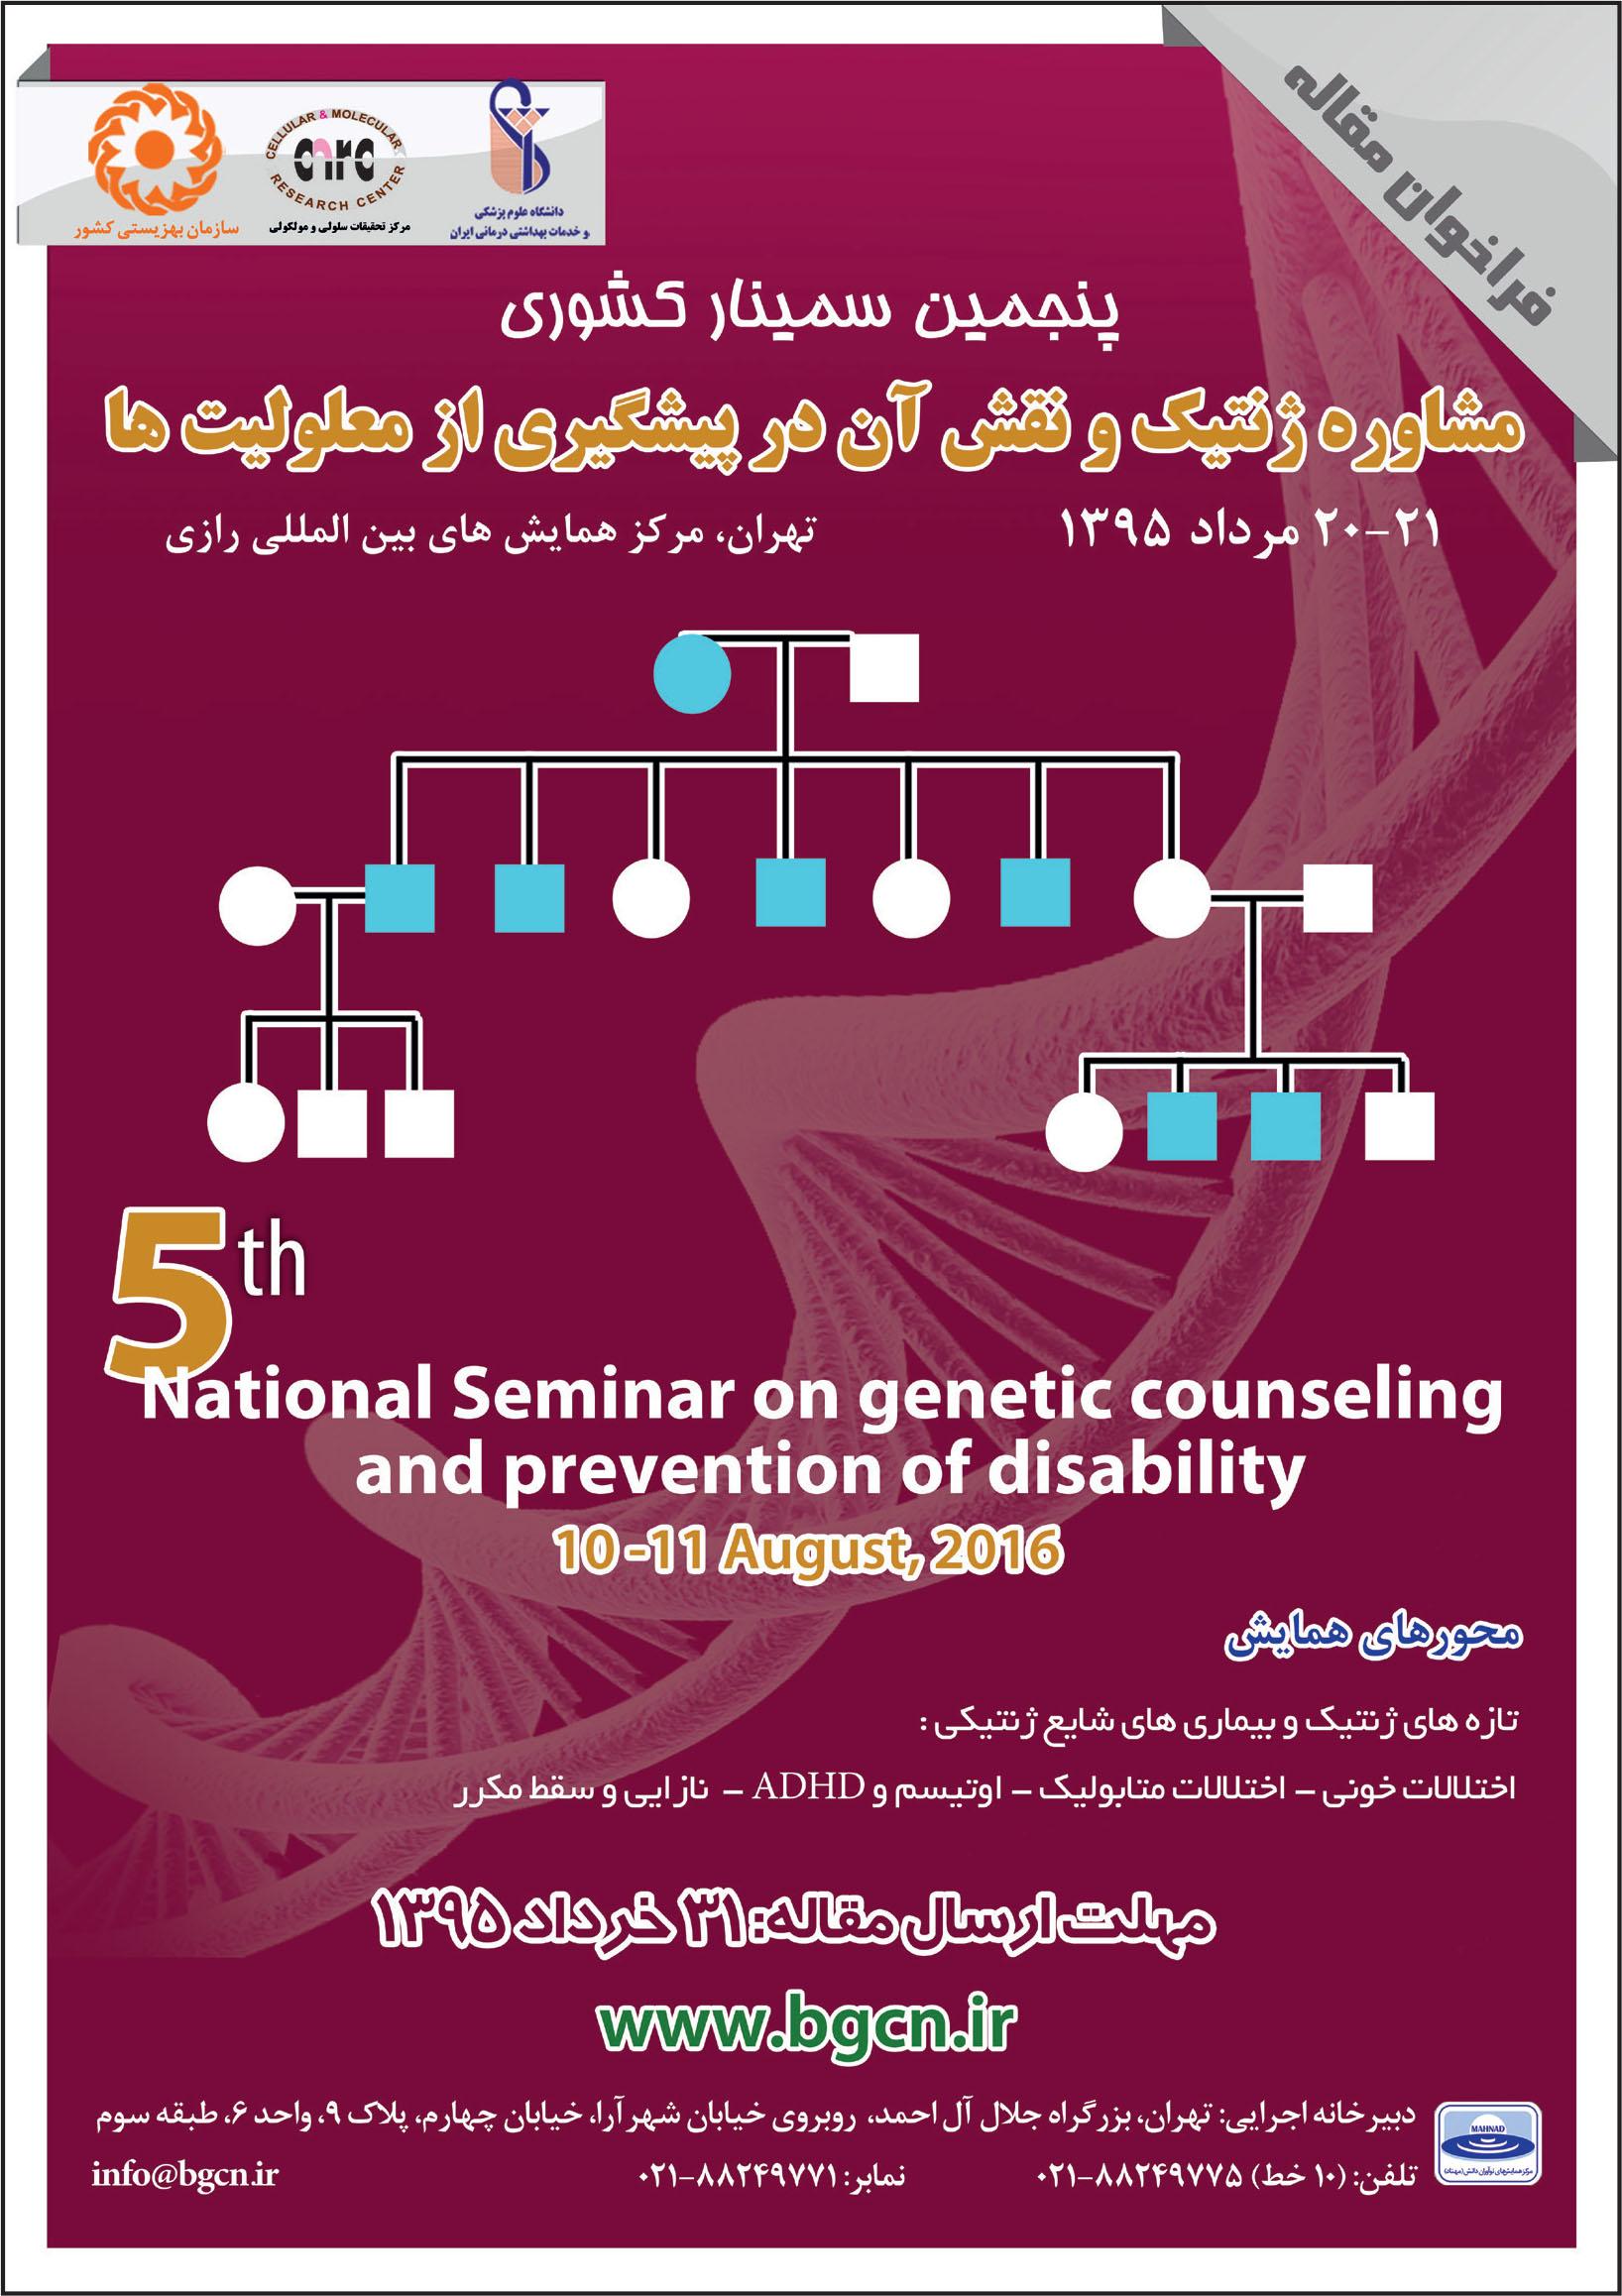 پنجمین سمینار کشوری مشاوره ژنتیک و نقش آن